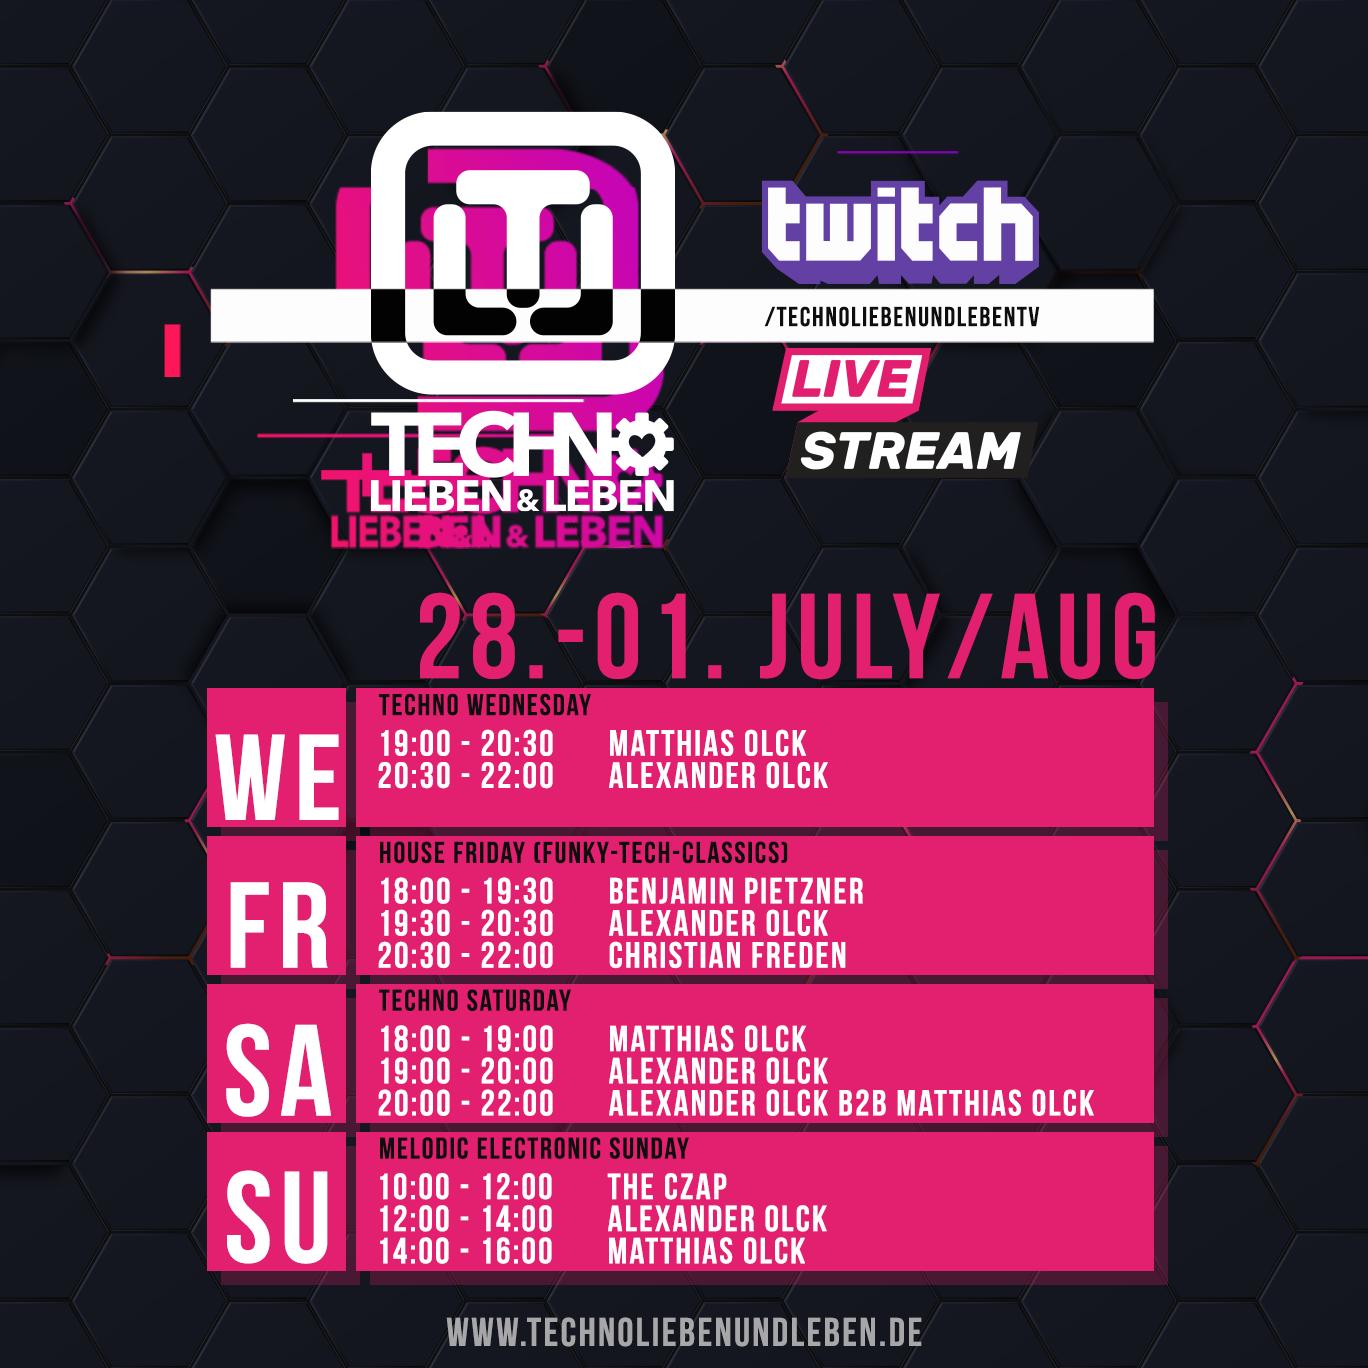 28. July - 01. August Twitch Livestream